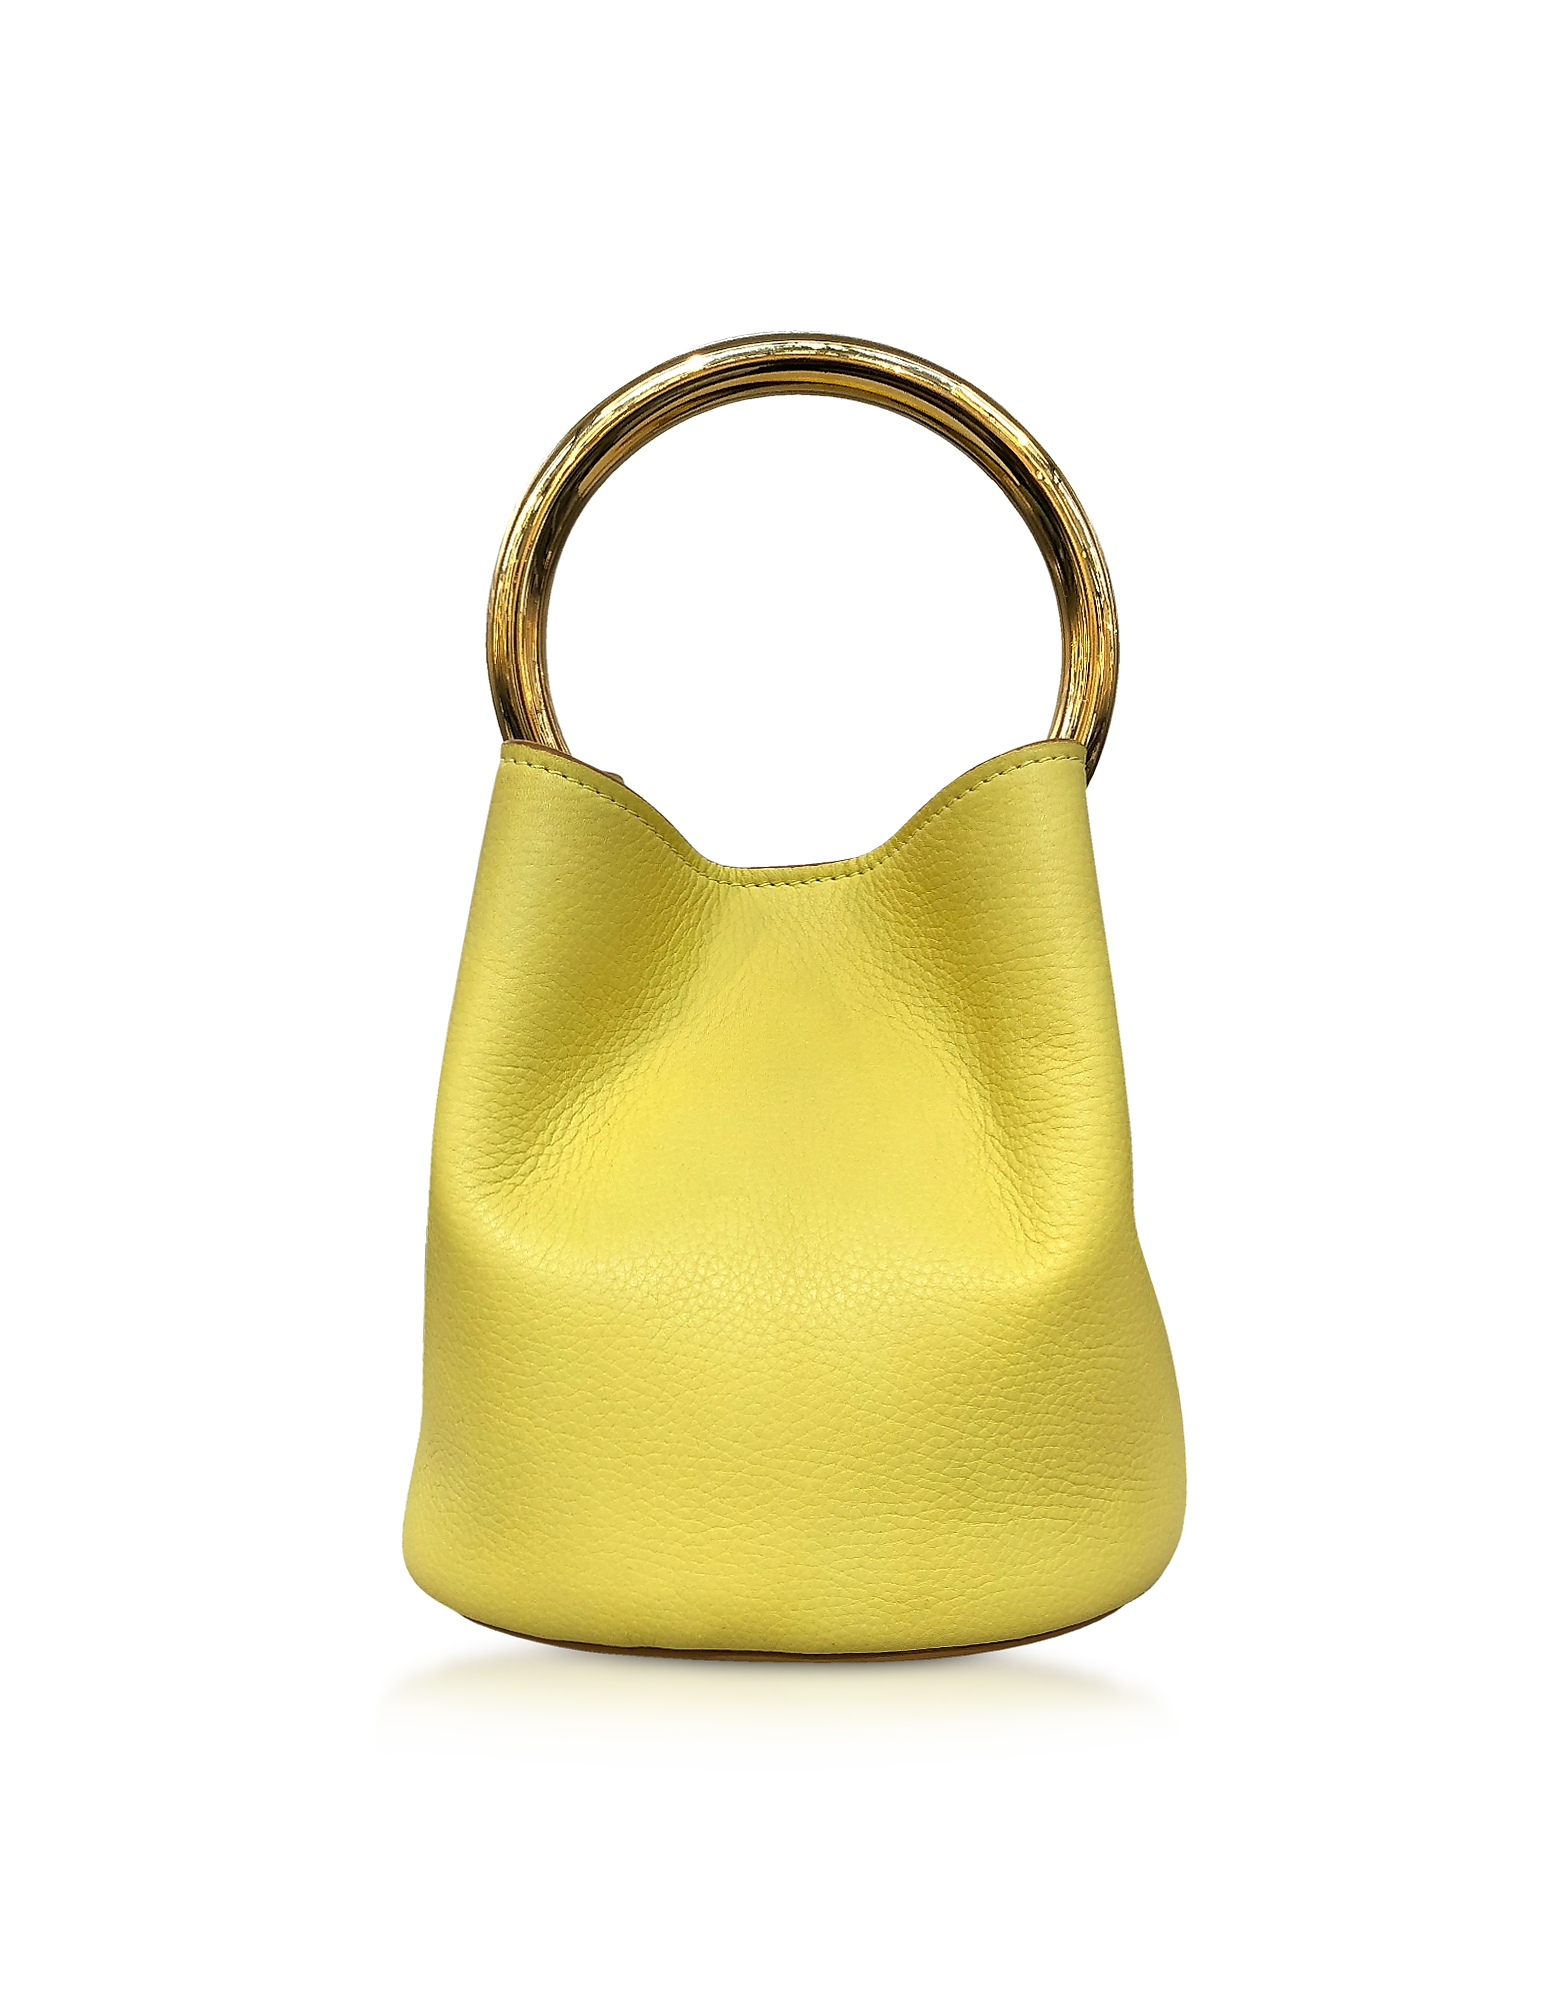 Marni Handbags, Citrus Leather Pannier Bag